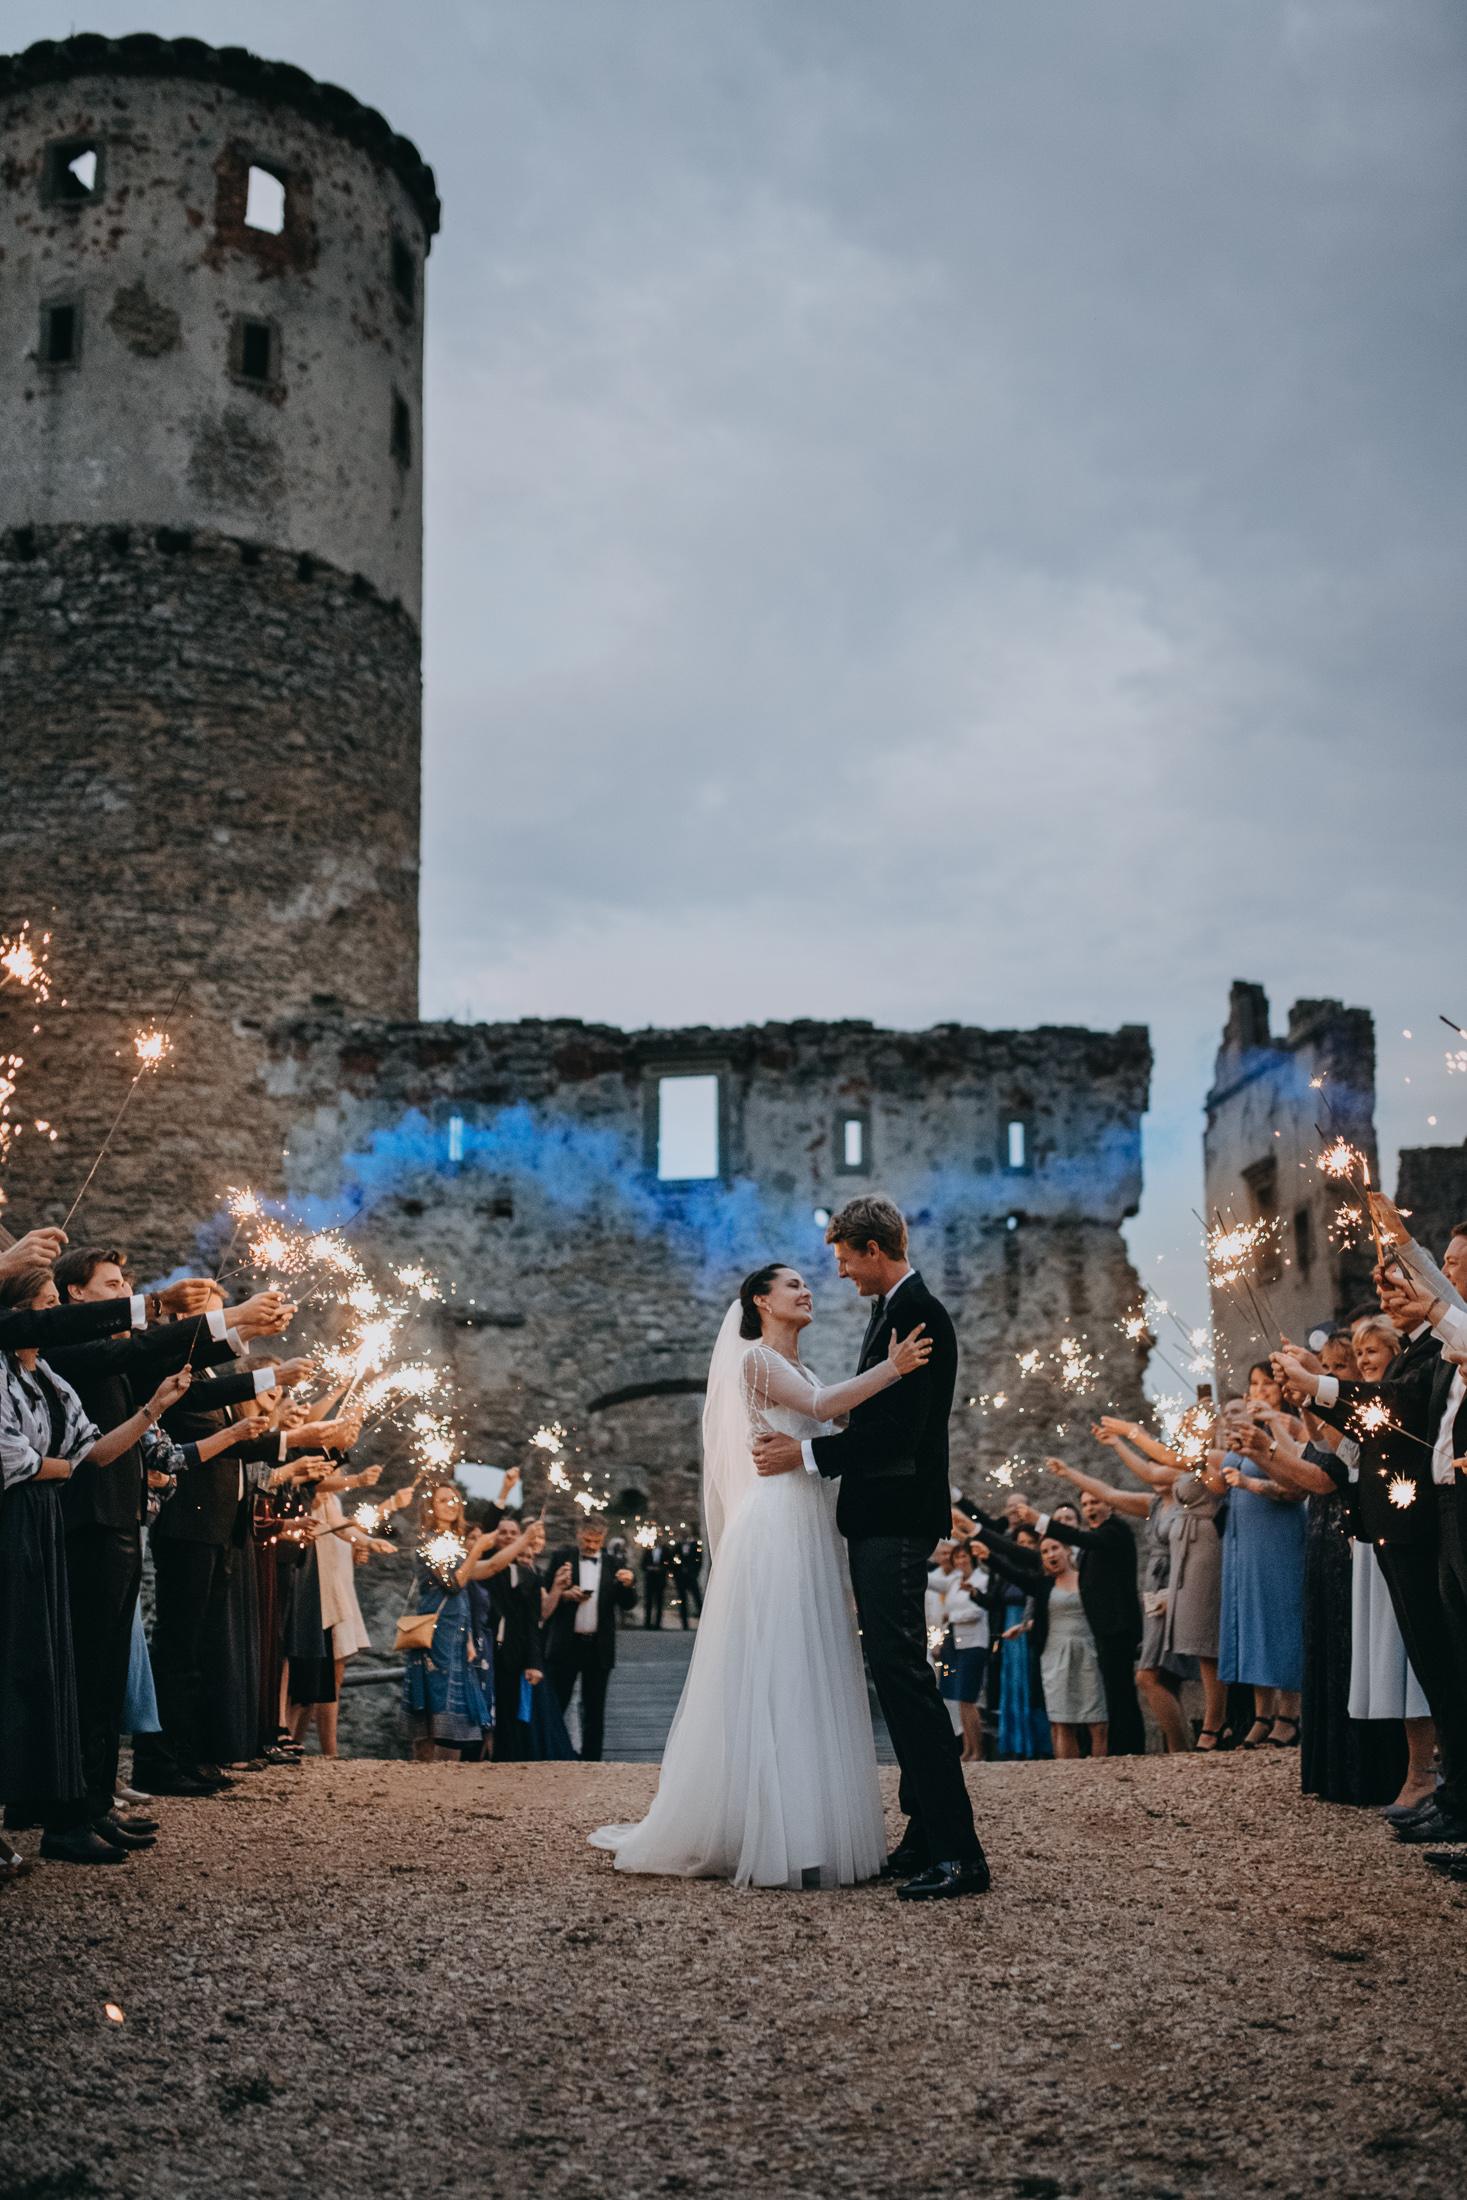 evening castle ruins wedding ceremony sparkles